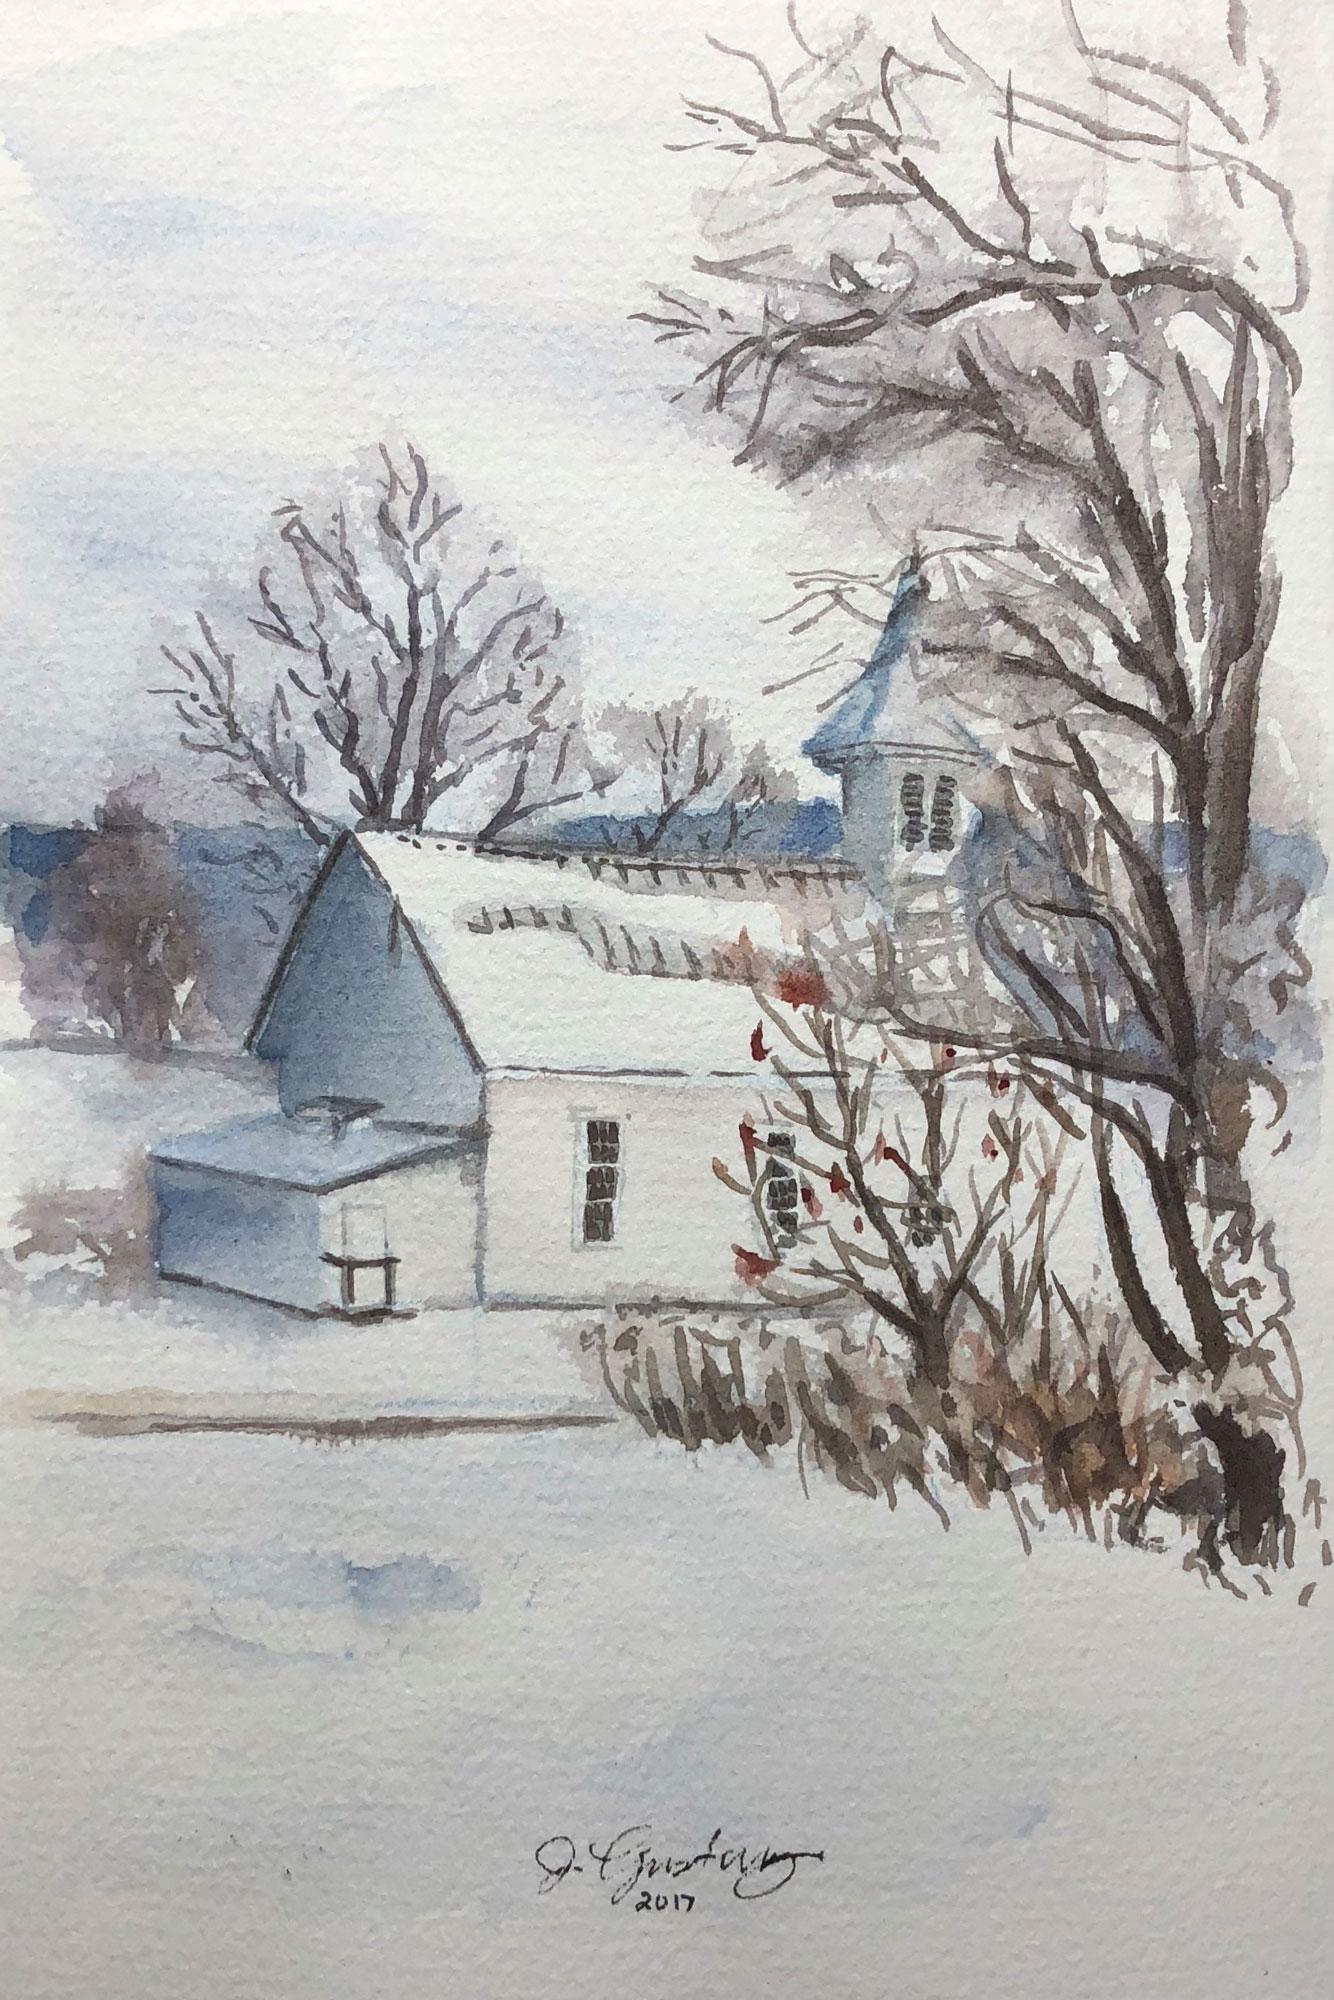 Heritage Center in Winter